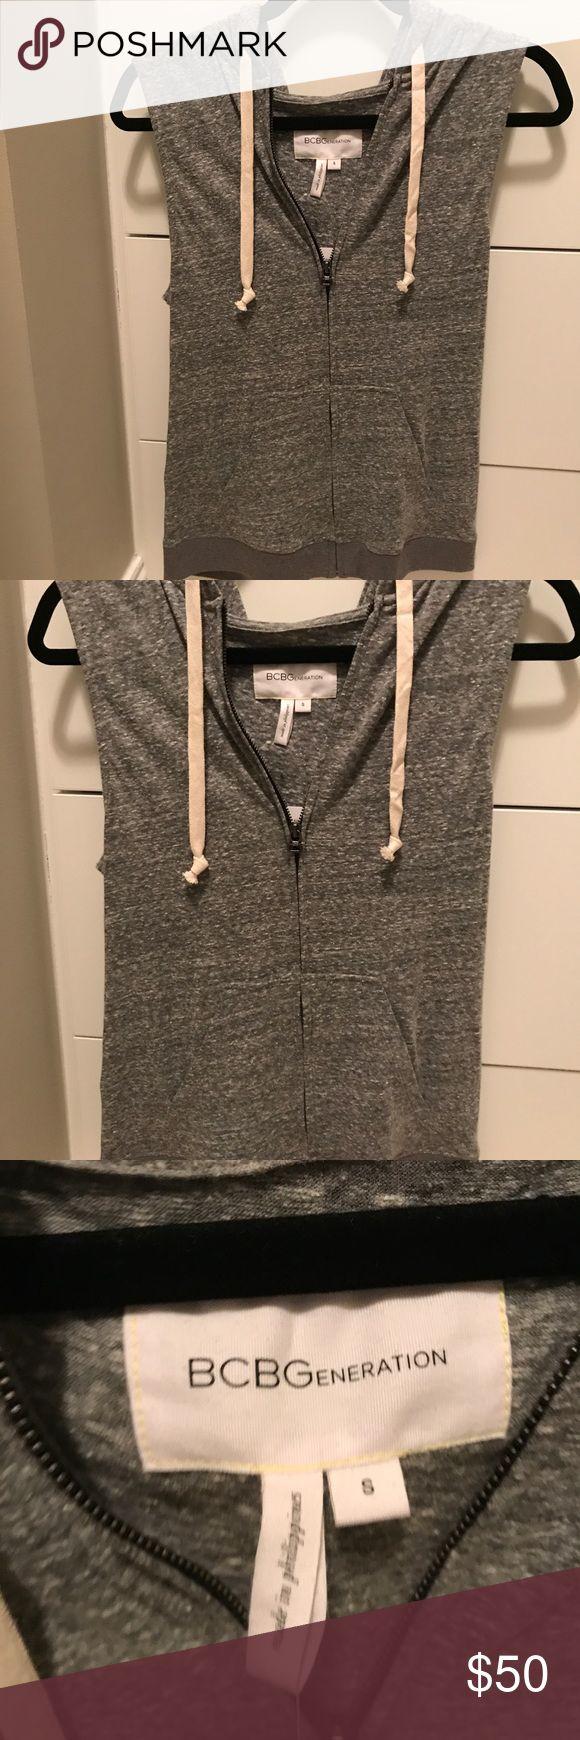 NWT BCBGeneration gray t shirt vest NWT BCBGeneration gray t shirt vest with hood, size small BCBGeneration Tops